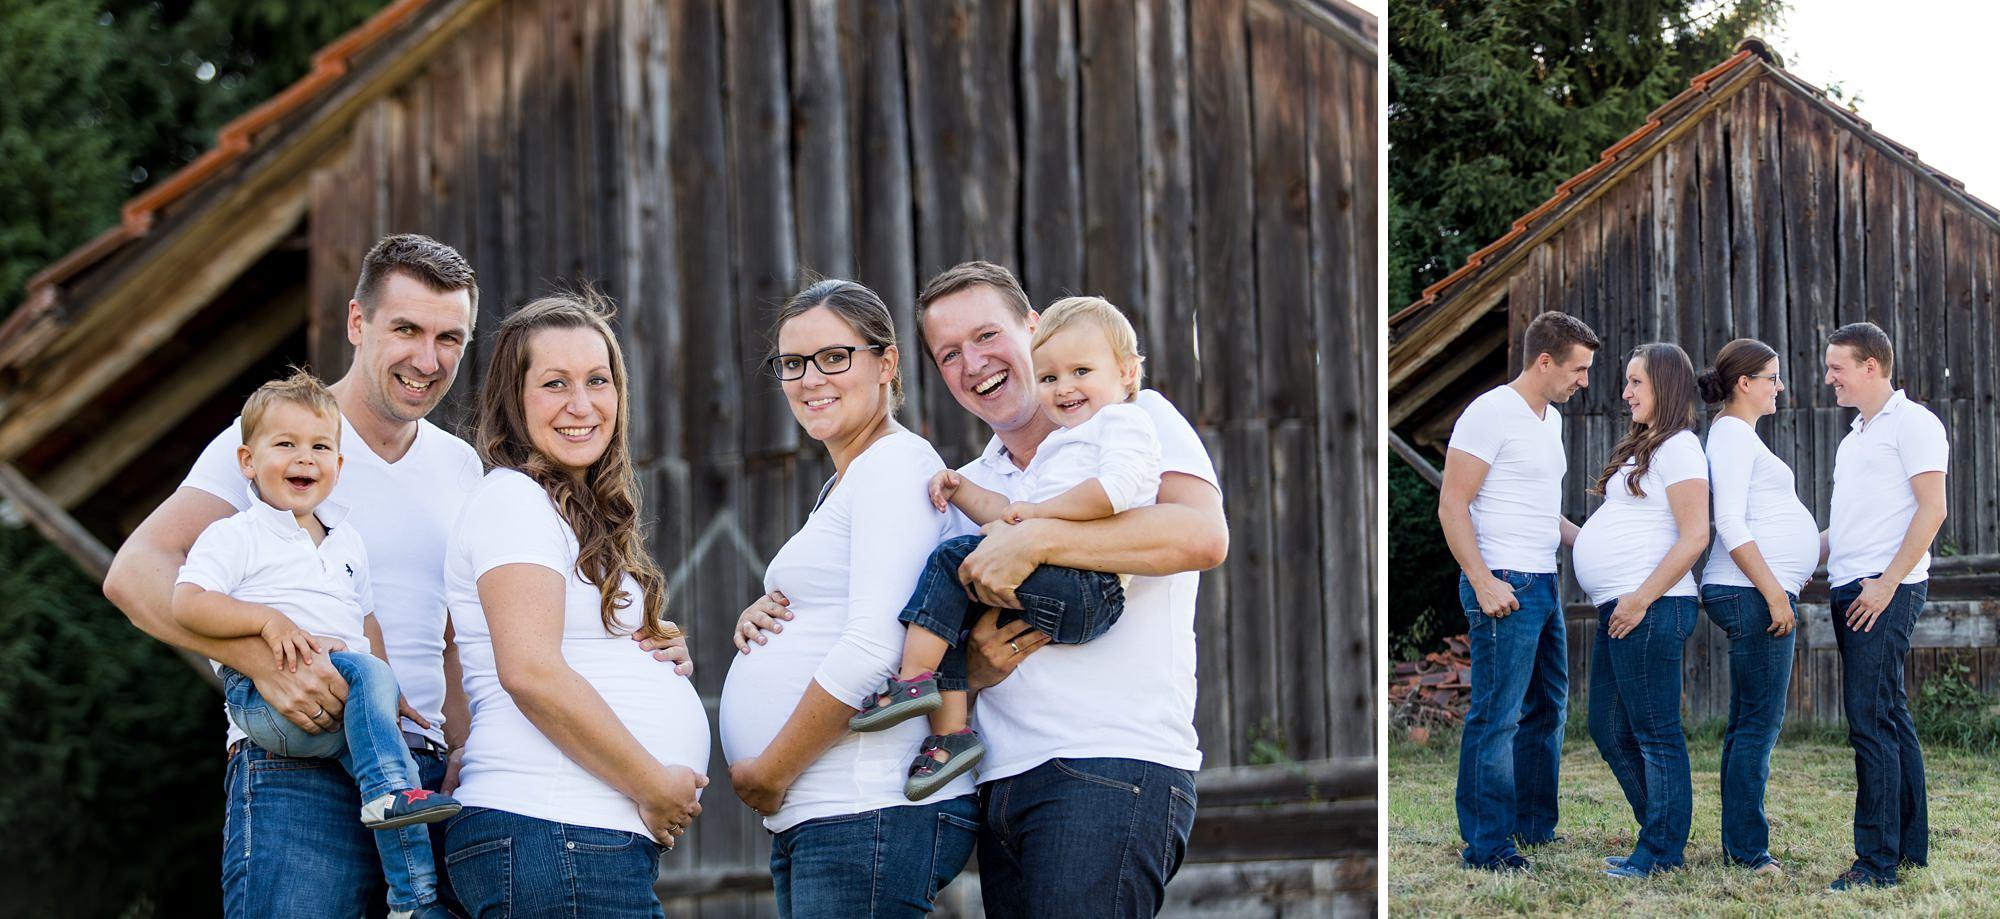 Familien-Shooting mit zwei schwangeren Müttern